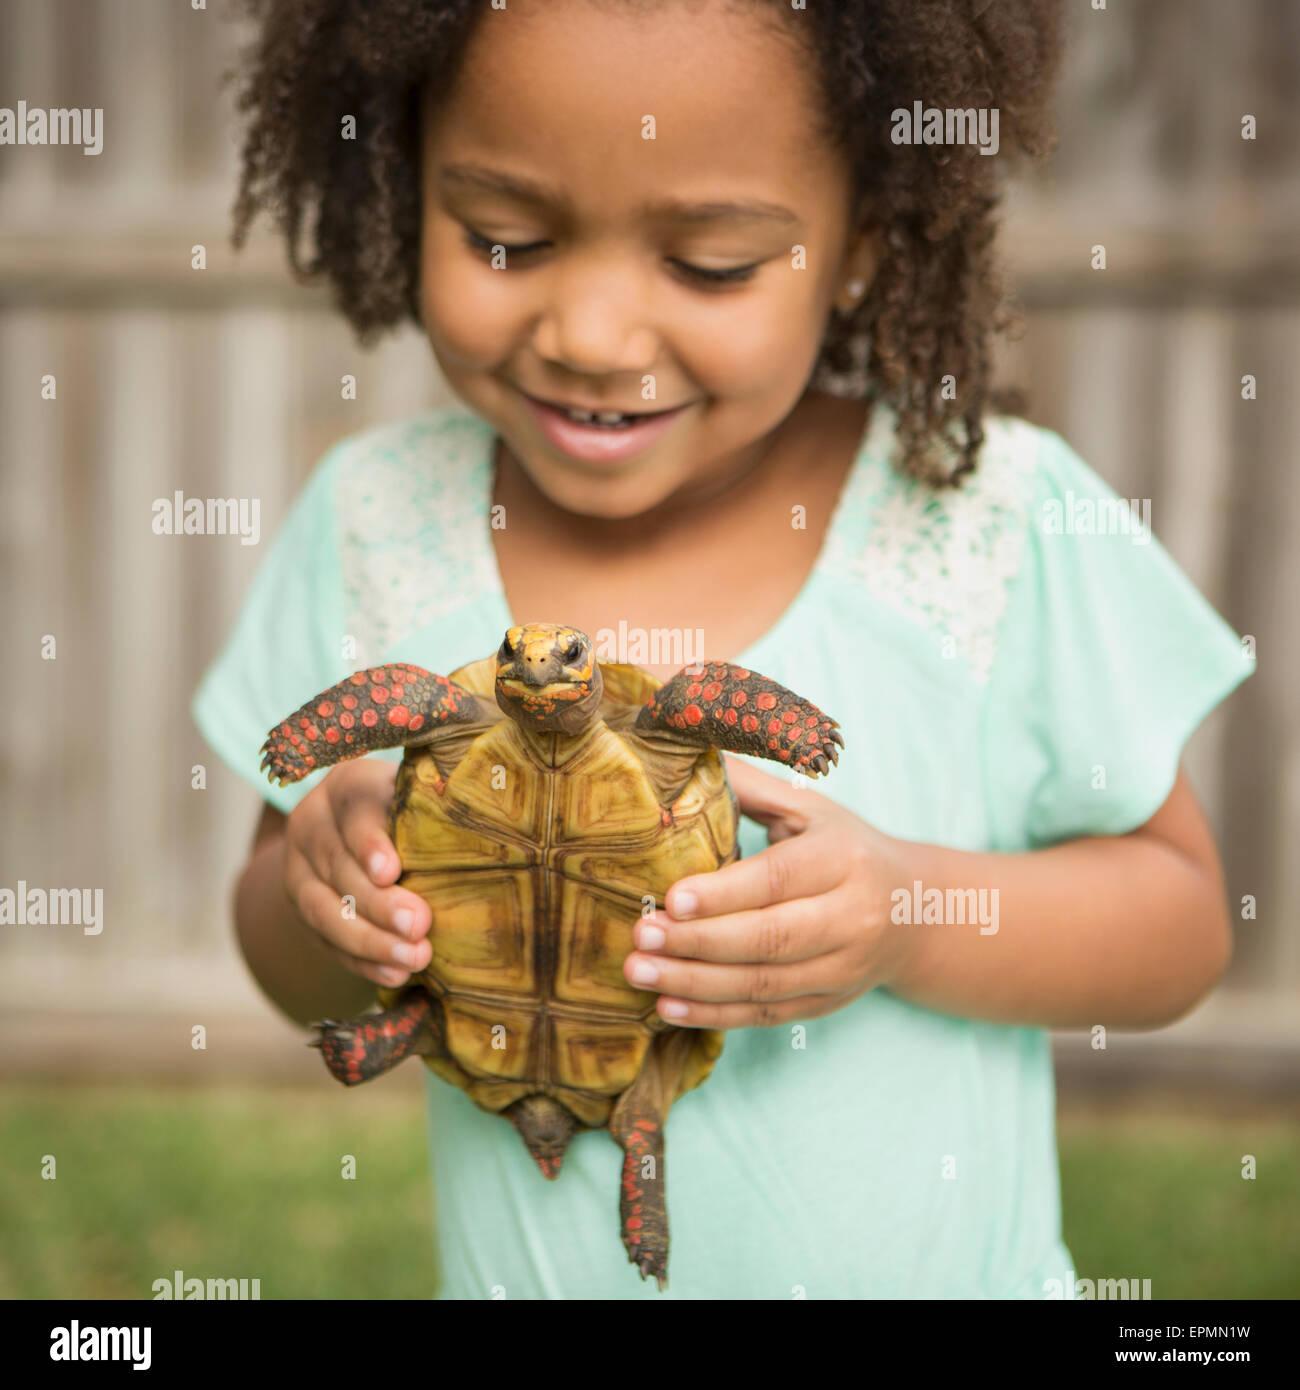 Ein Kind hält eine Schildkröte. Stockbild